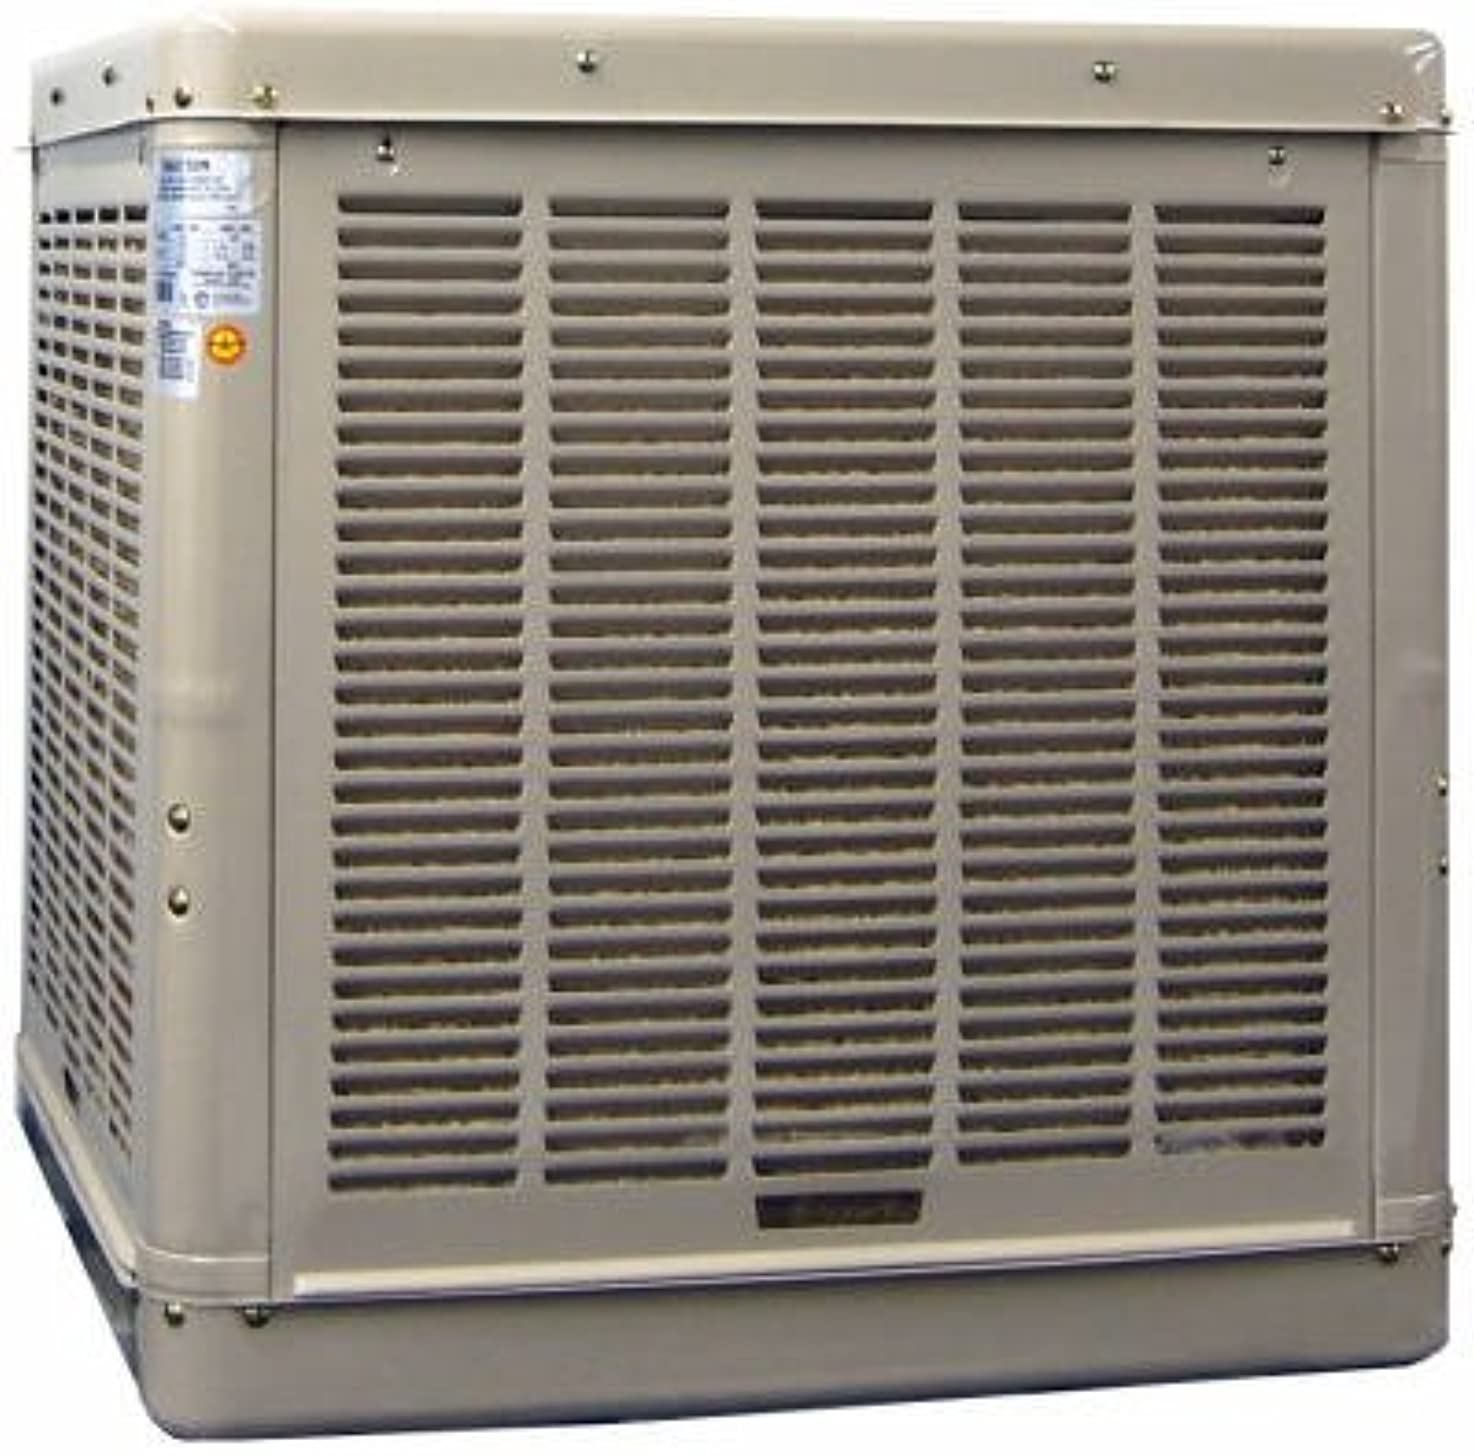 CHAMPION 3000DD Dd Cabinet Evaporative Cooler dowwqsbvtvkzj2